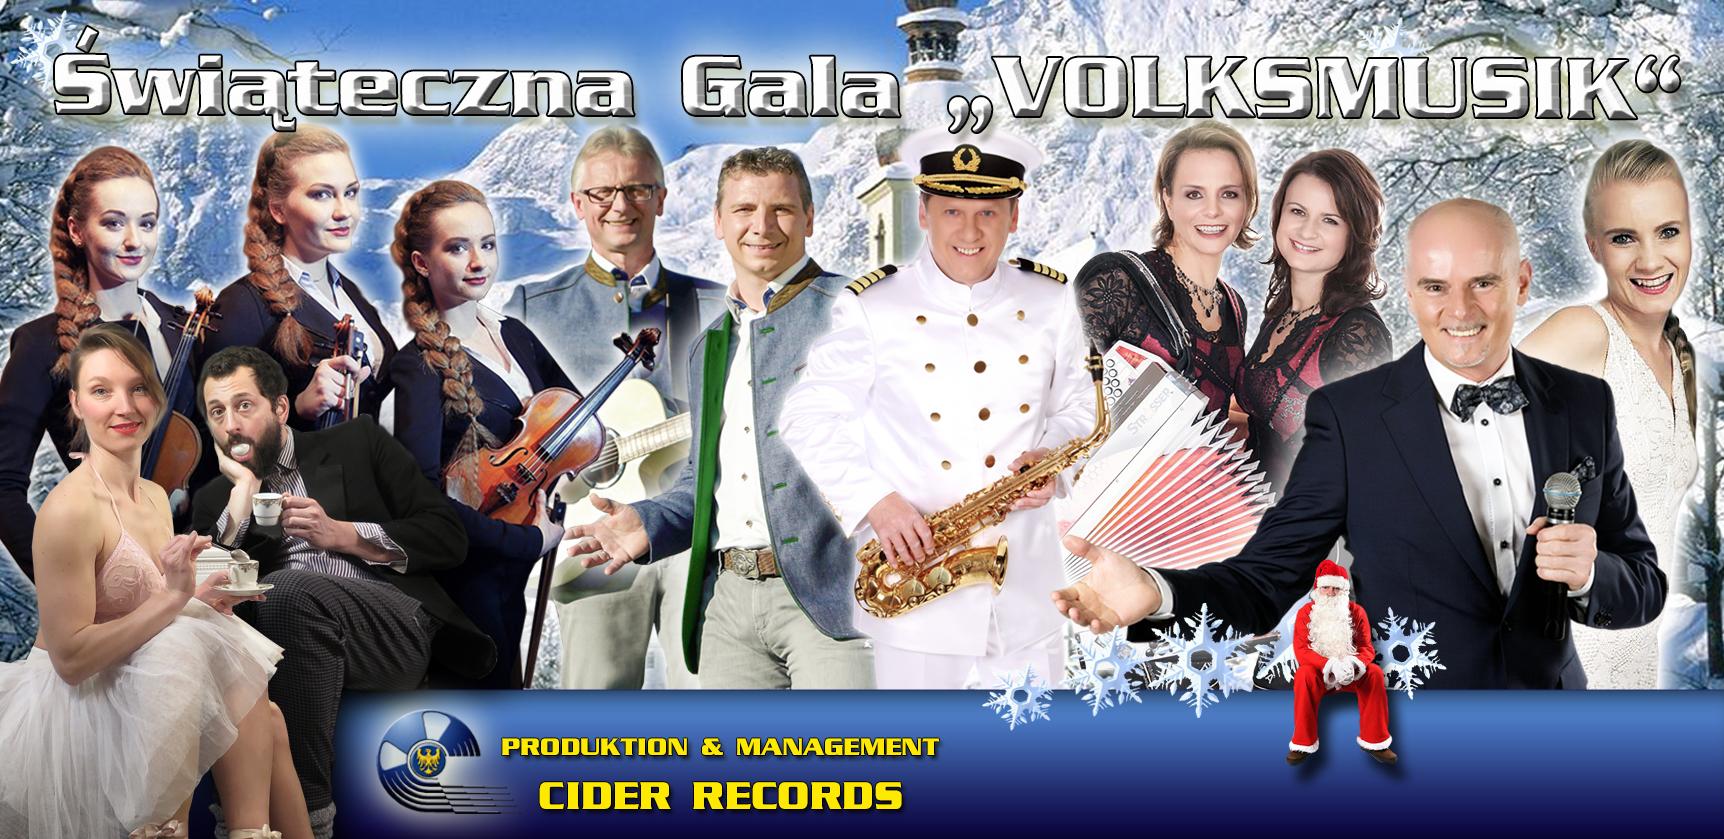 http://www.dmit.com.pl/files/dmit/2k18/volksmusik.jpg